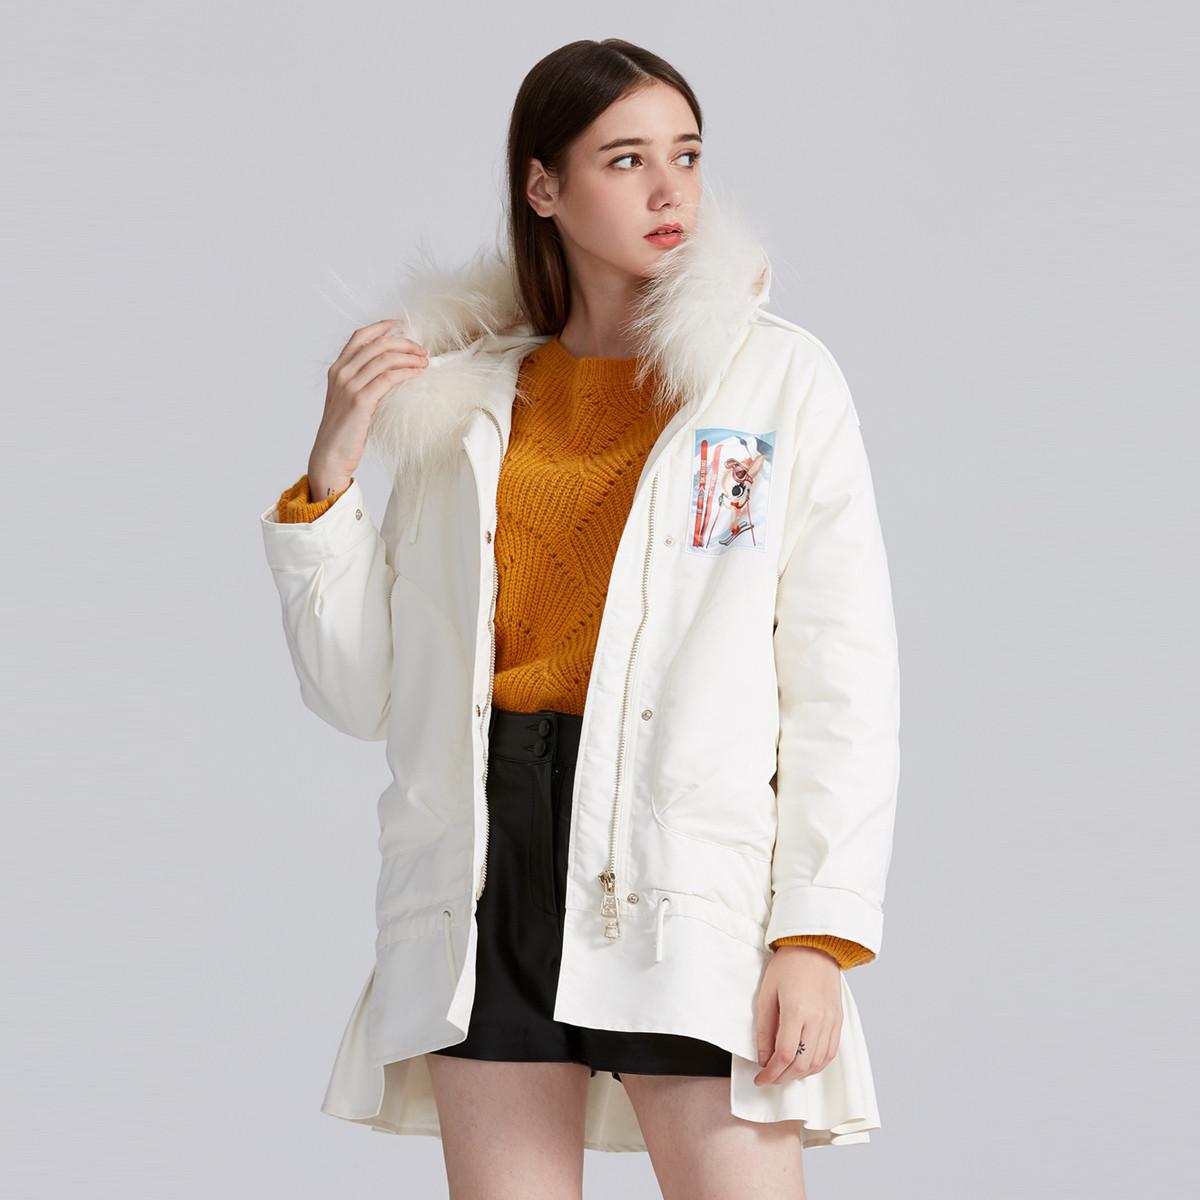 FIVE PLUSFive Plus女冬装毛领连帽夹棉外套女中长款棉服宽松长袖开襟2GA4044440010